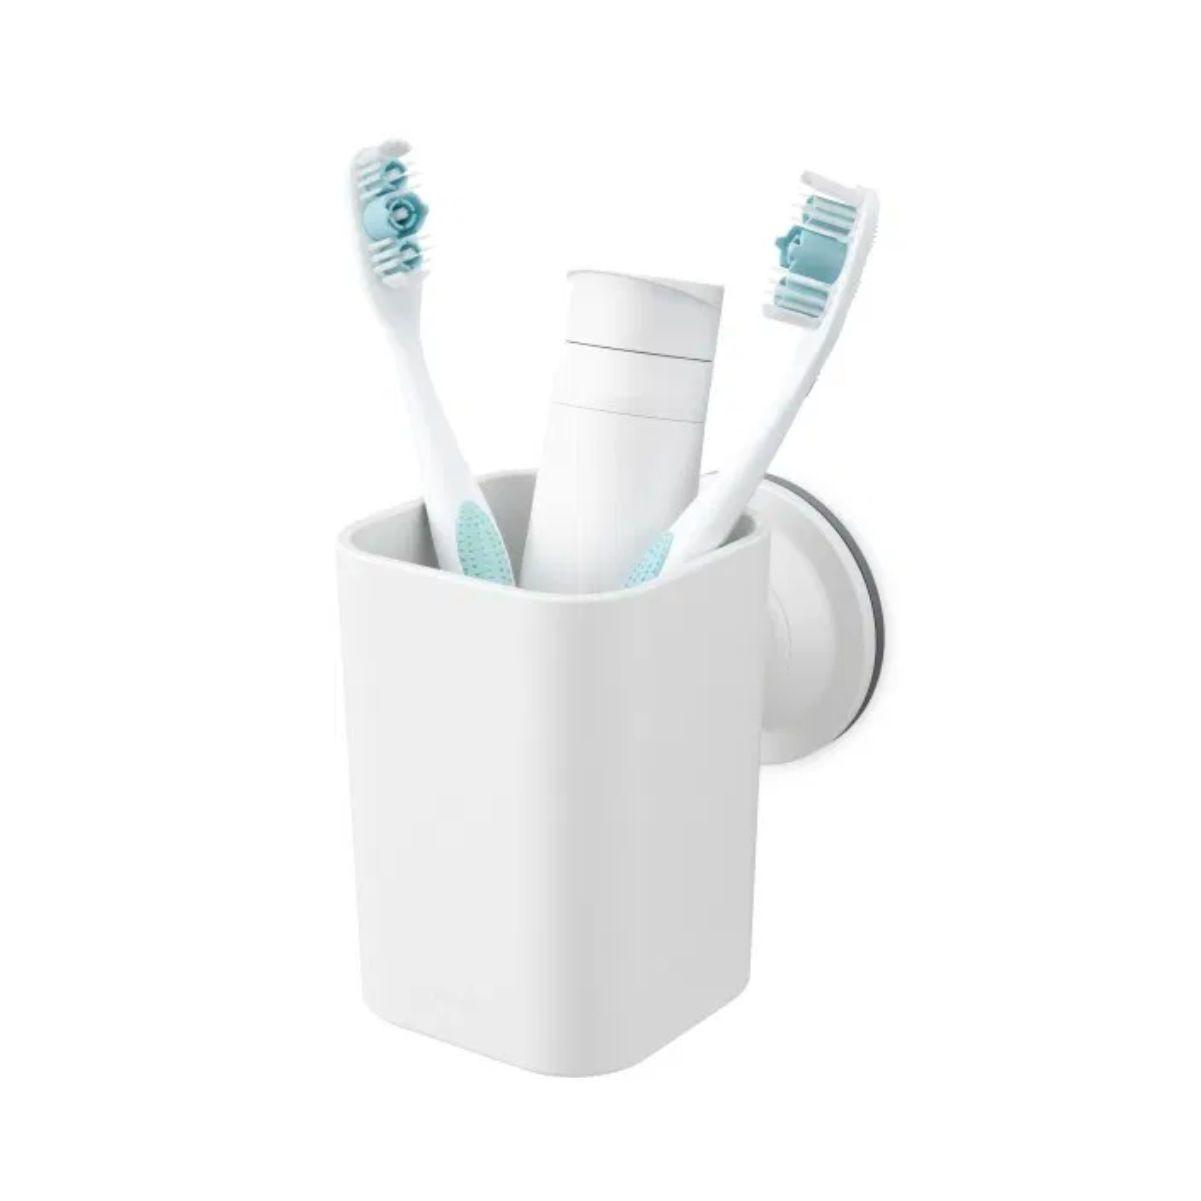 Umbra USA Inc. Toothbrush Holder/Organizer Sure-Lock White